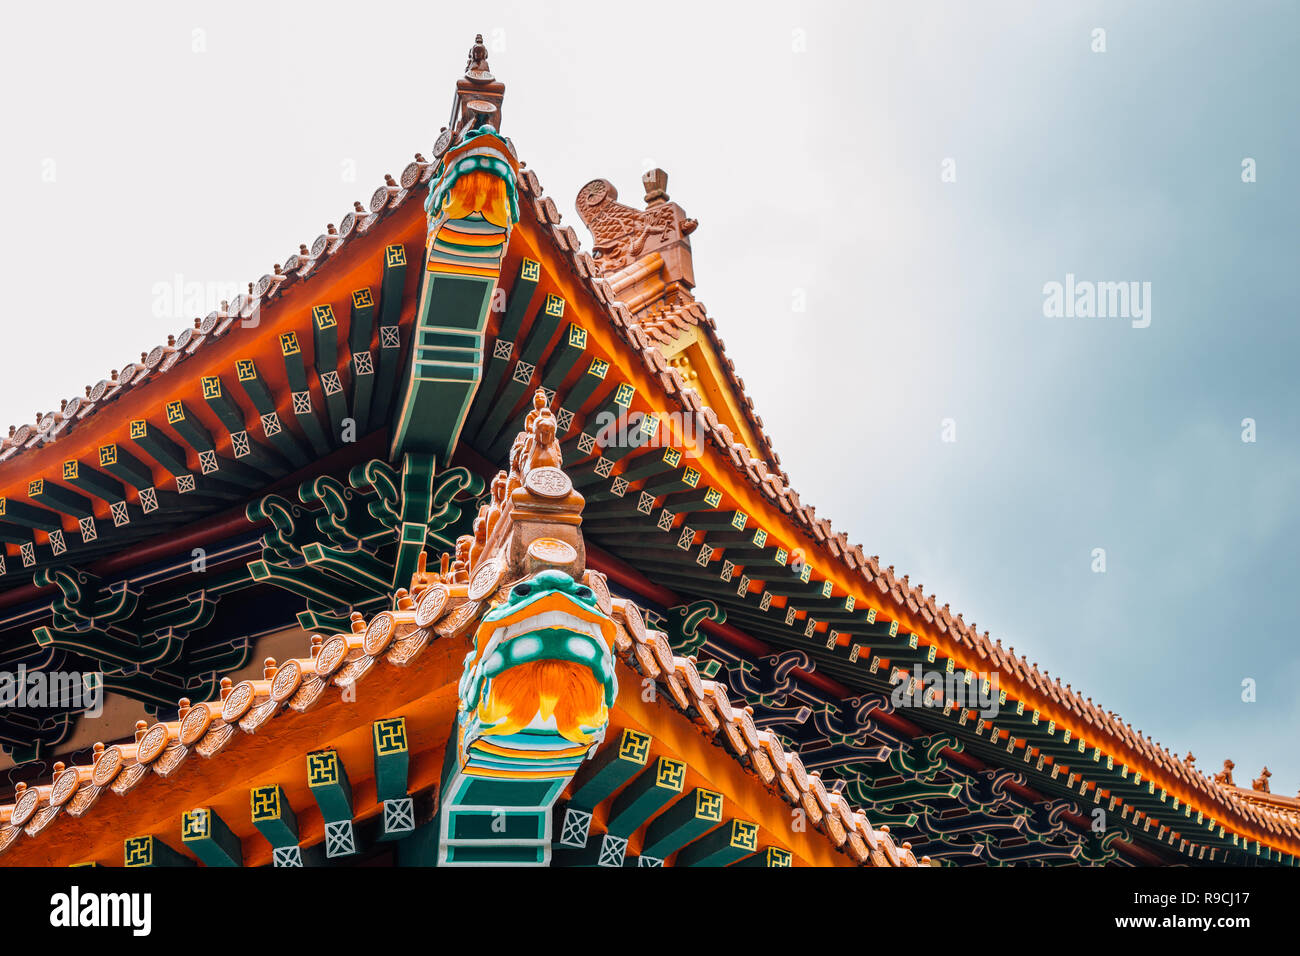 Chinese traditional roof at Po Lin Monastery in Lantau Island Hong Kong - Stock Image